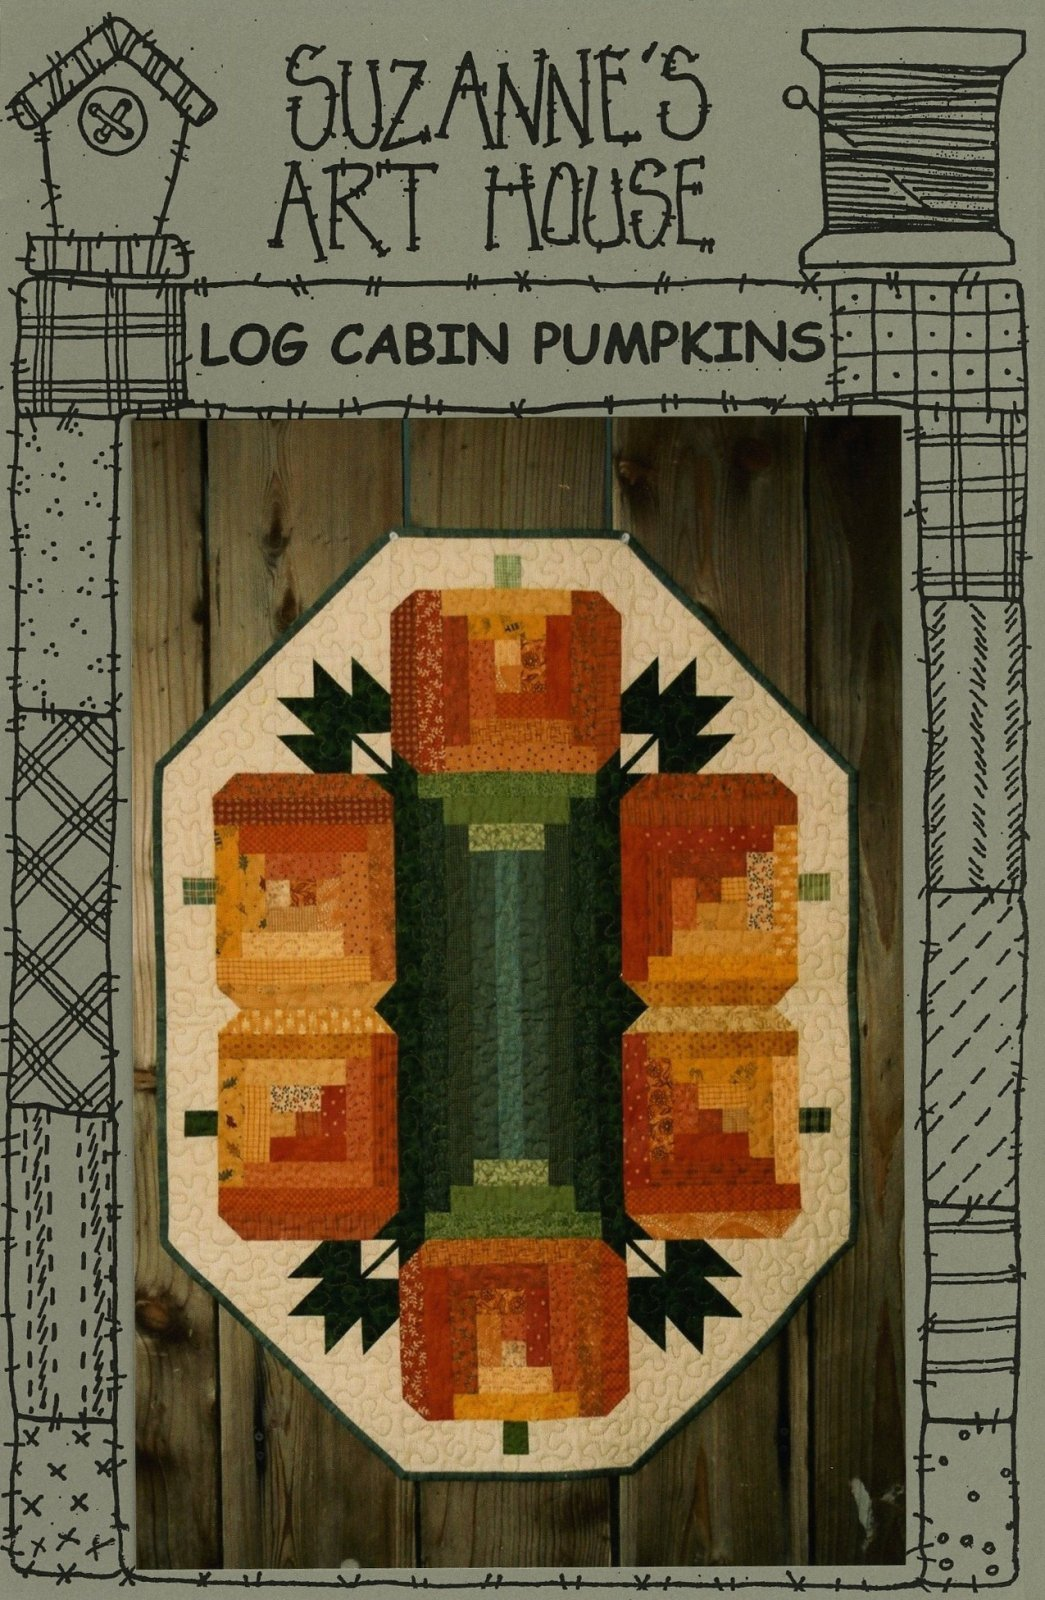 Log Cabin Pumpkins